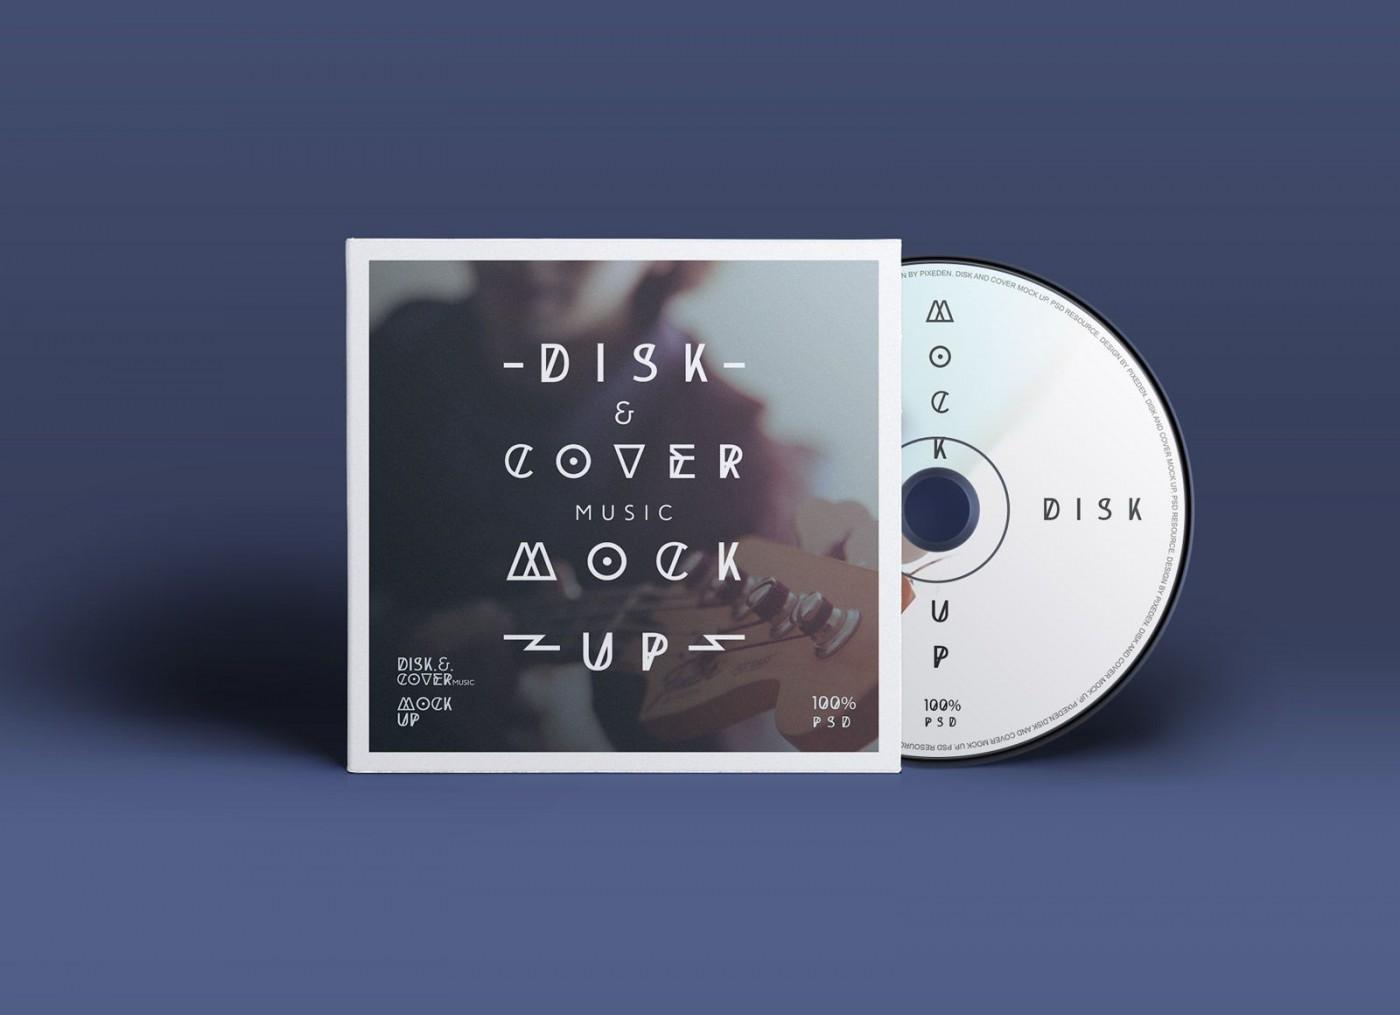 004 Singular Cd Cover Design Template Photoshop High Resolution  Label Psd Free1400